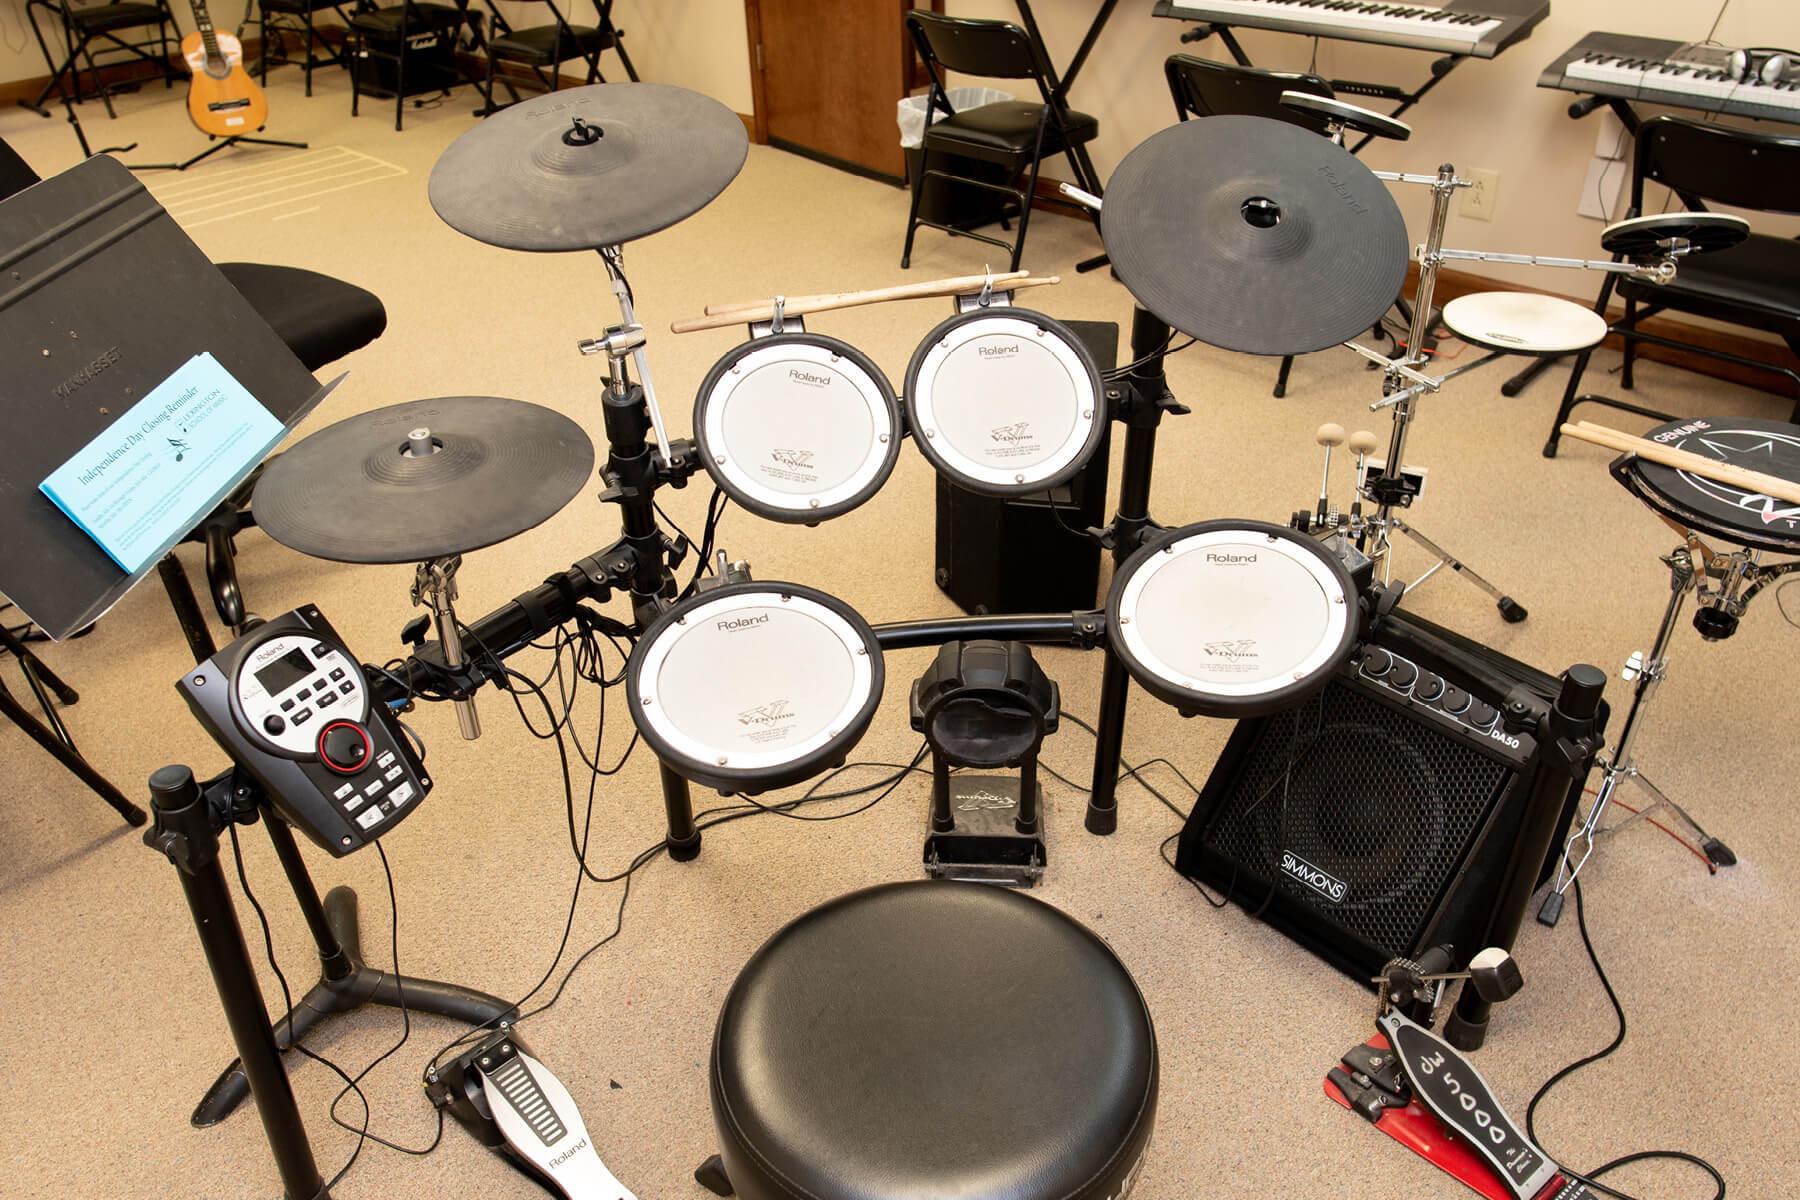 Lexington School of Music digital drum kit available for drum lessons.